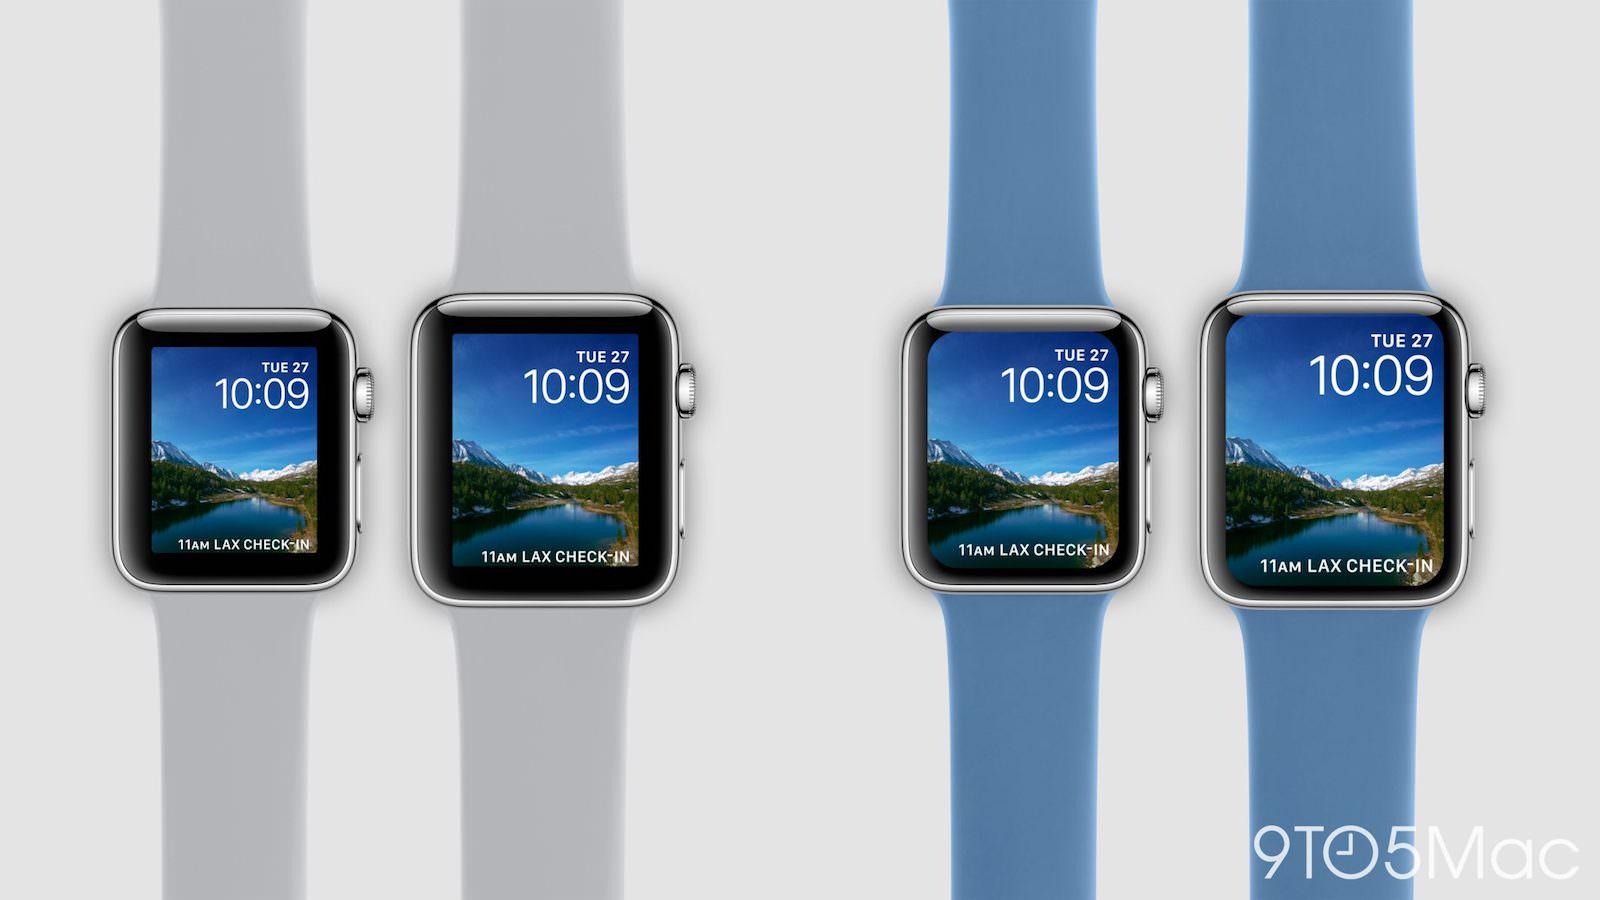 apple_watch_new_9to5mac_1.jpg